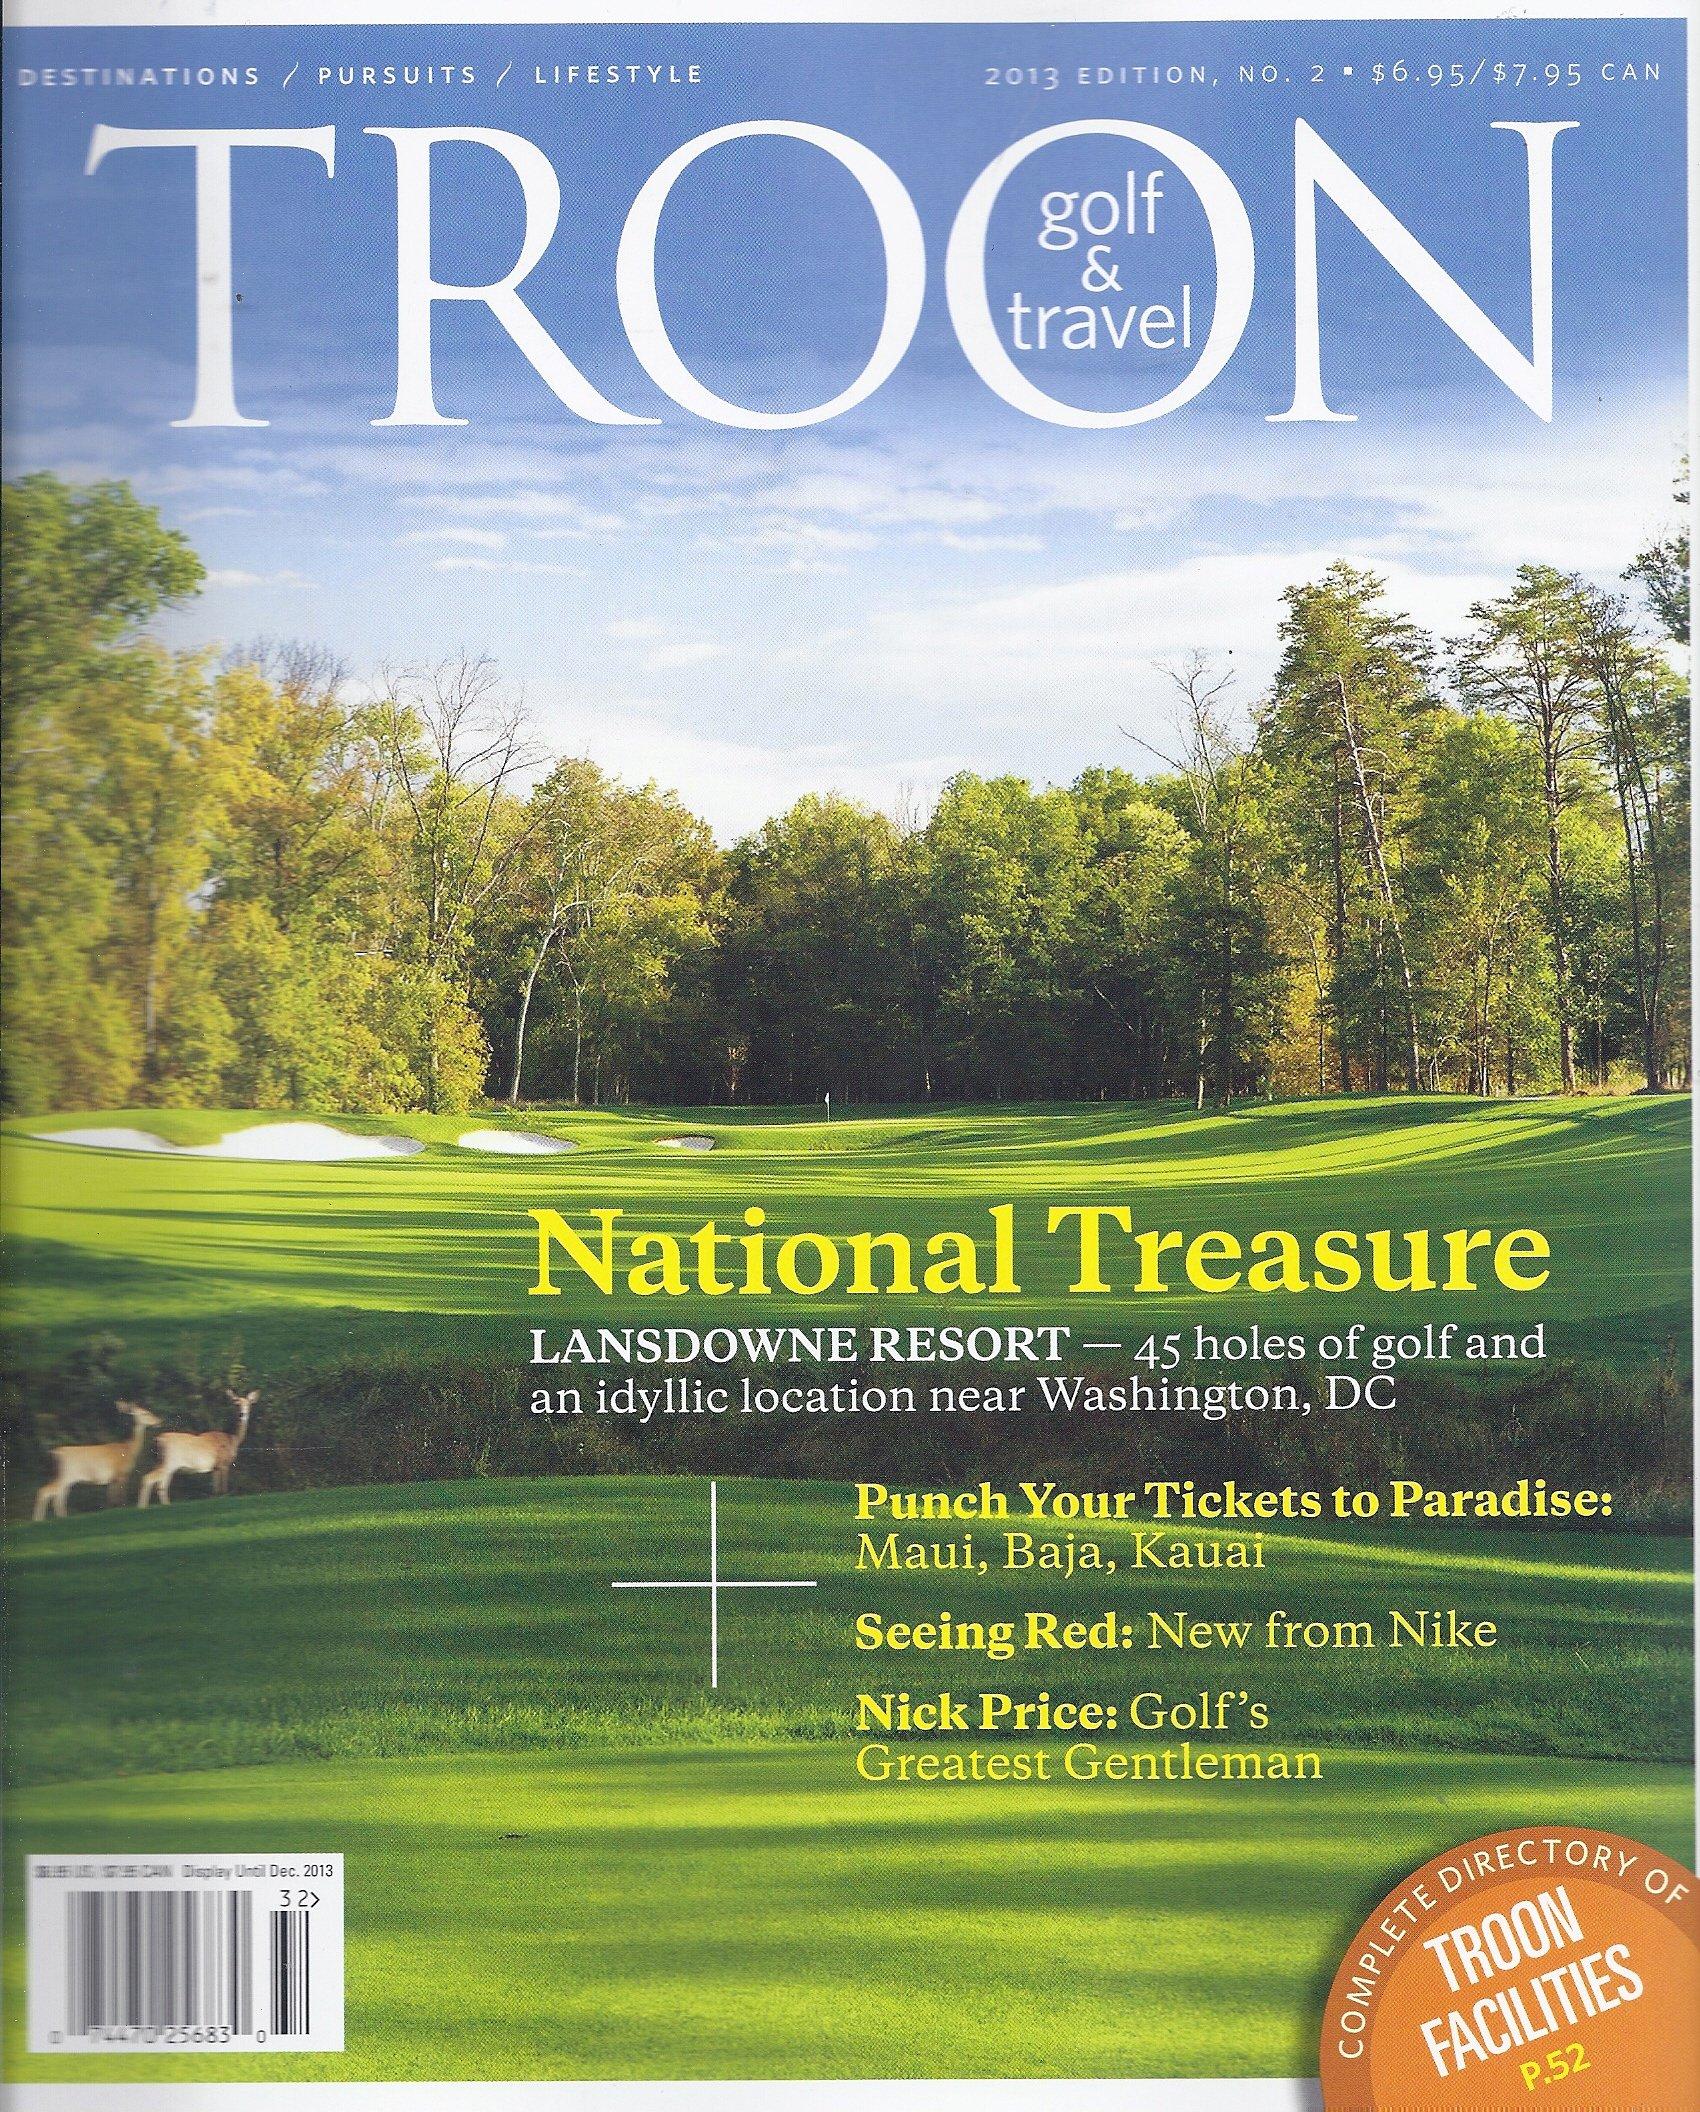 Troon Golf & Travel (#2) (2013 Edition) pdf epub